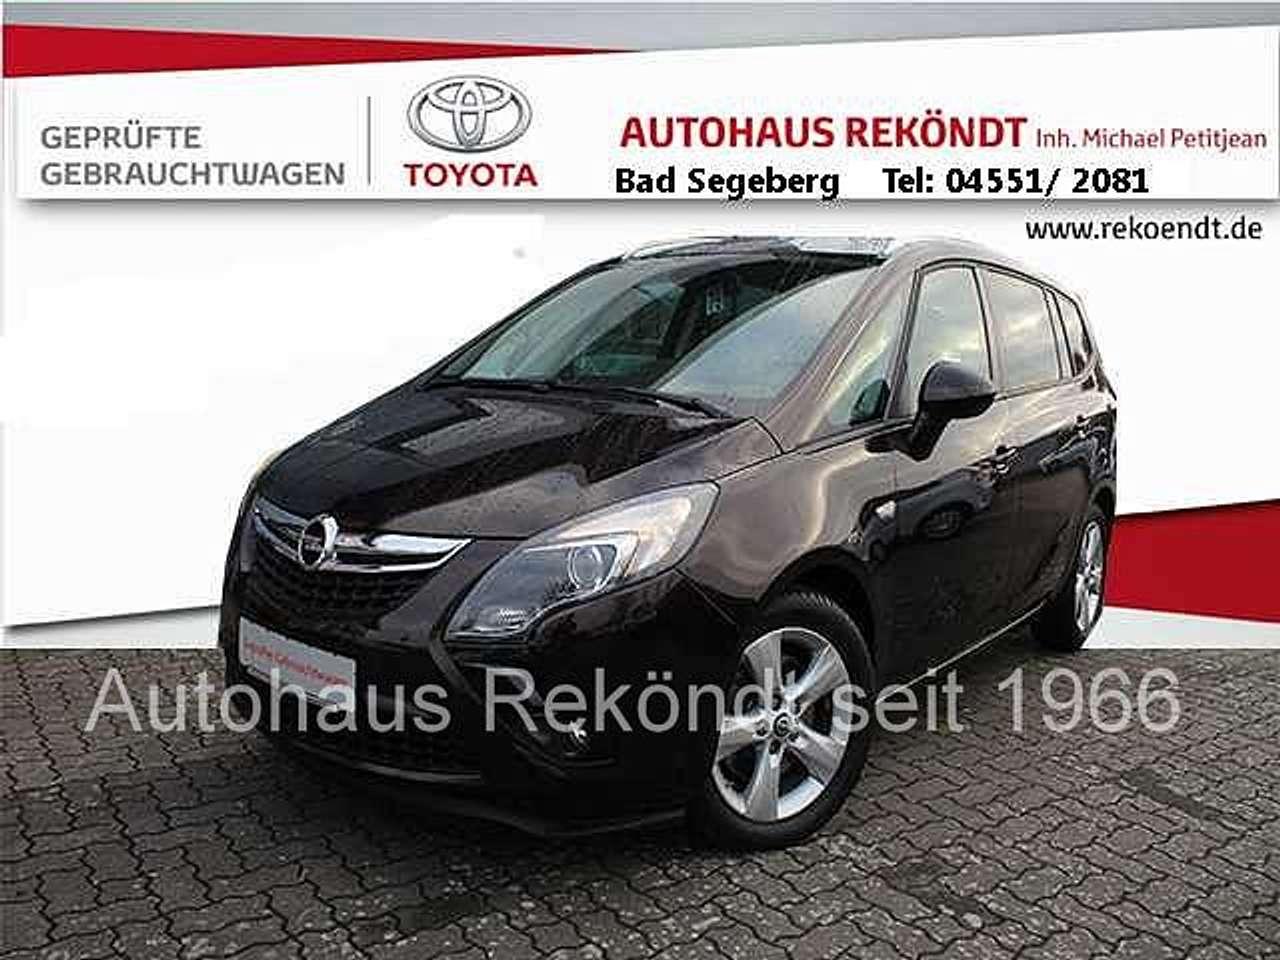 Autos nach Opel Astra GTC 2.0 CDTI